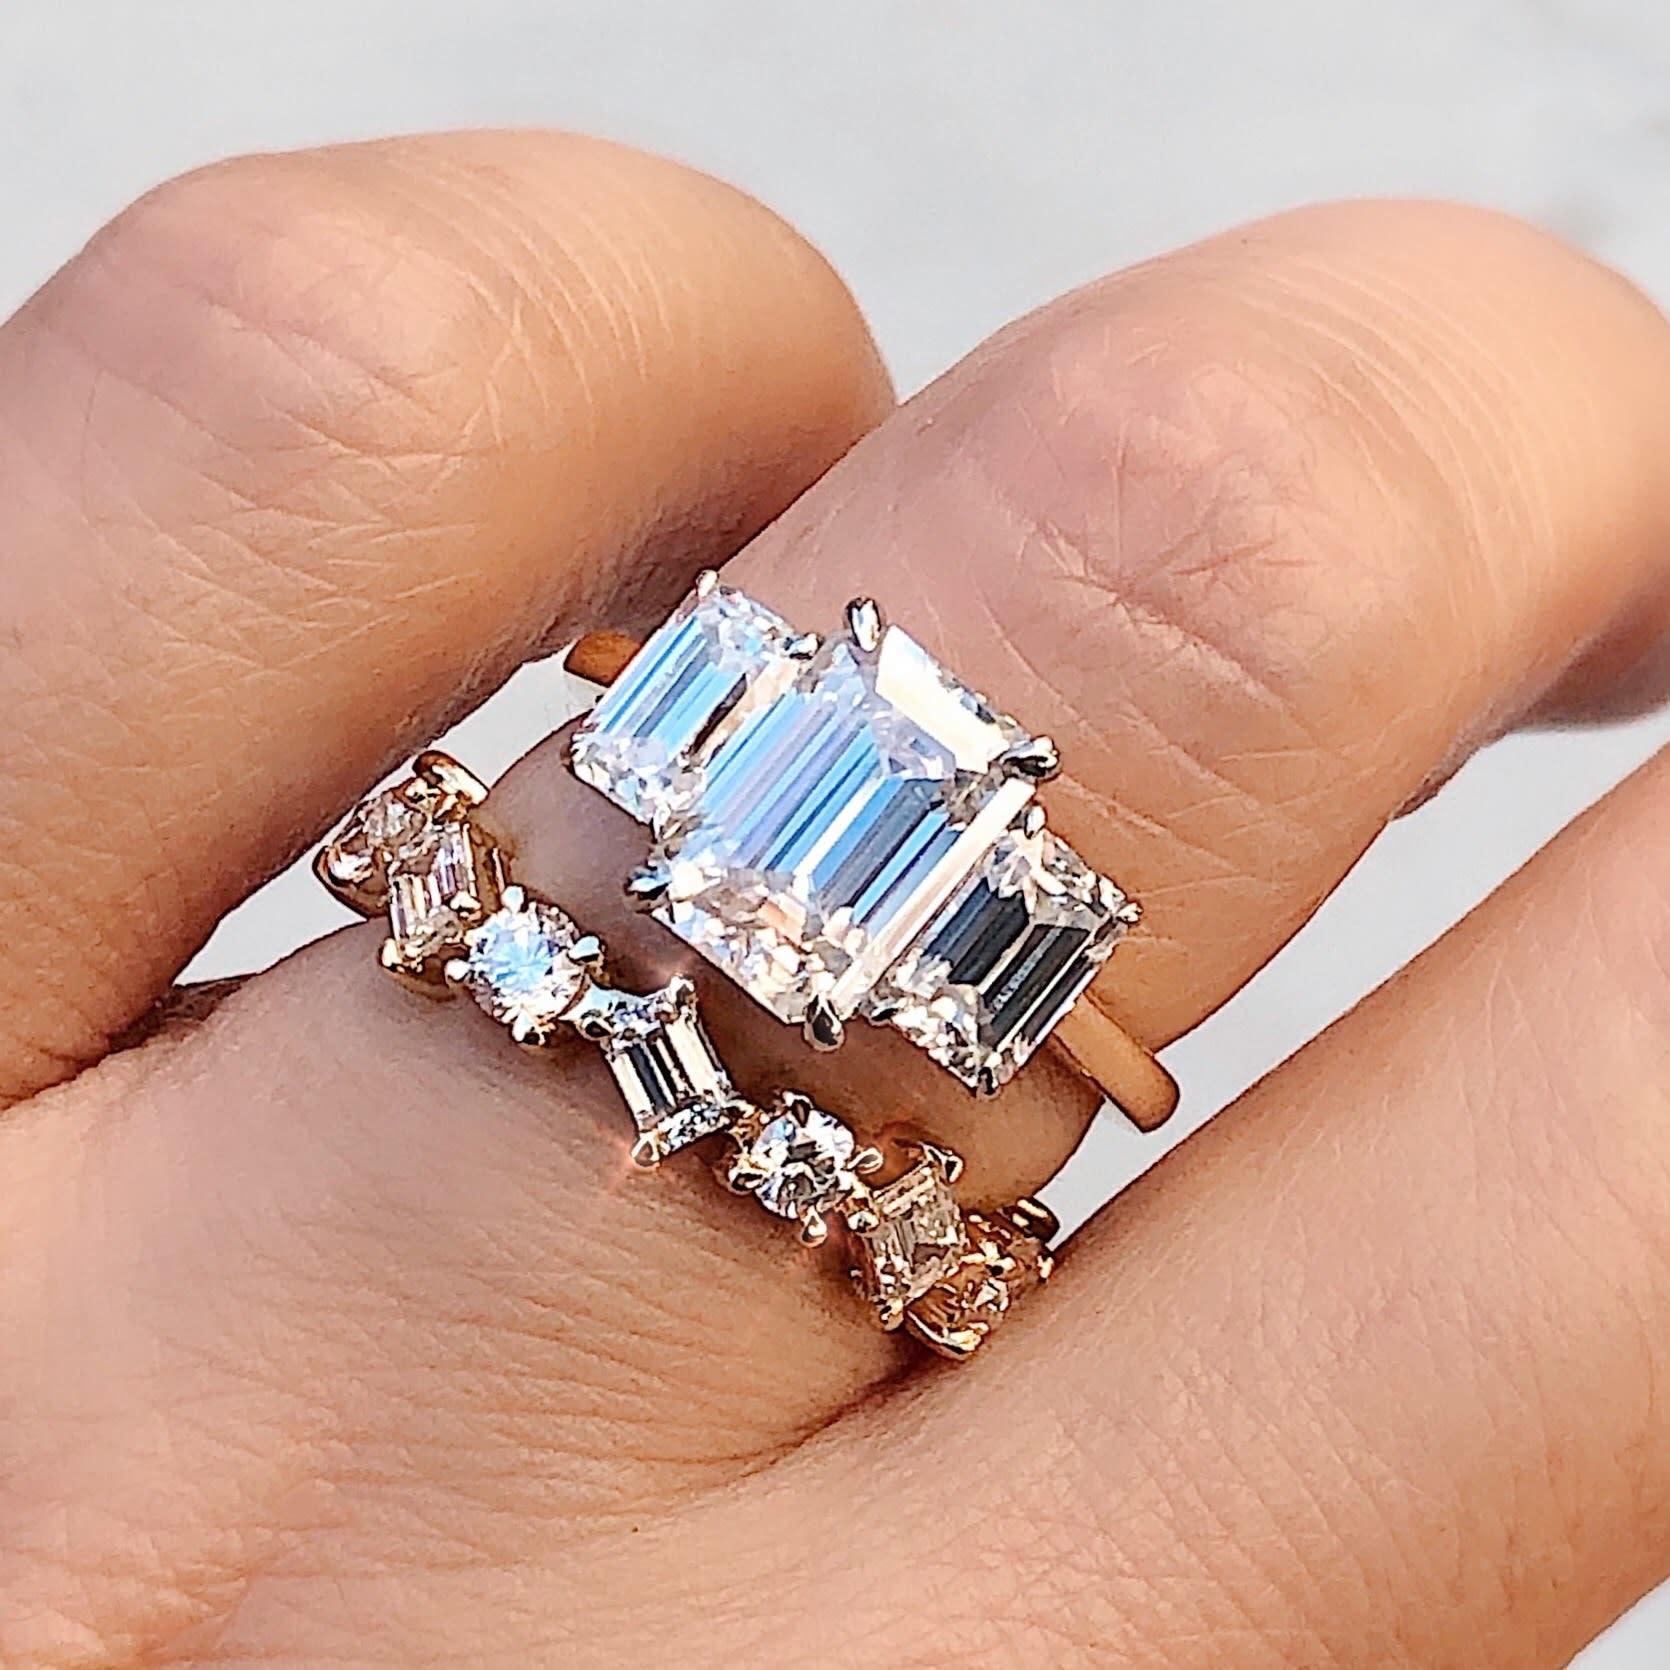 Trabert Goldsmiths 2ct Emerald Cut Moissanite Trinity Ring